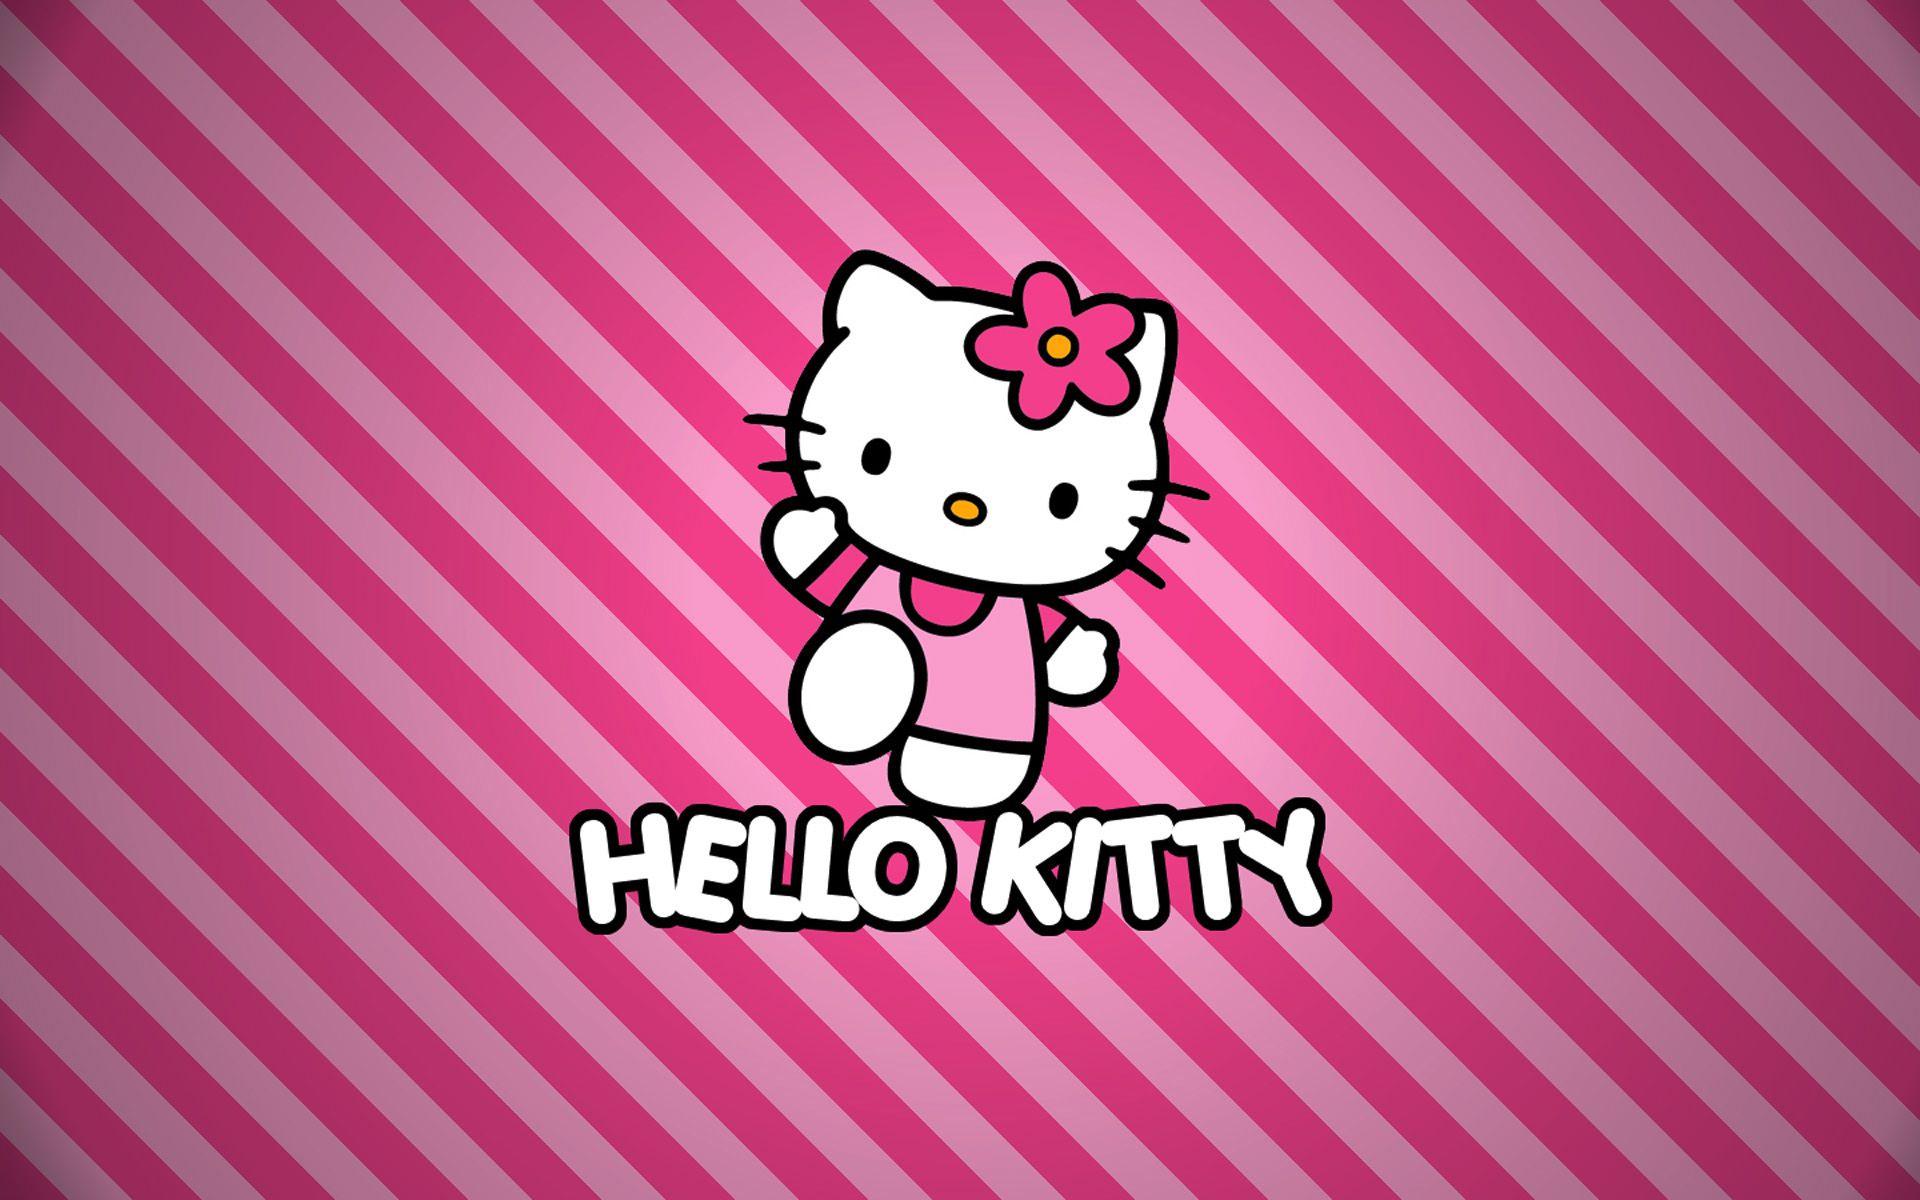 Top Wallpaper Hello Kitty Face - 3c2040e4ec9b2336b21ba4a43904a6d3  Photograph_968312.jpg